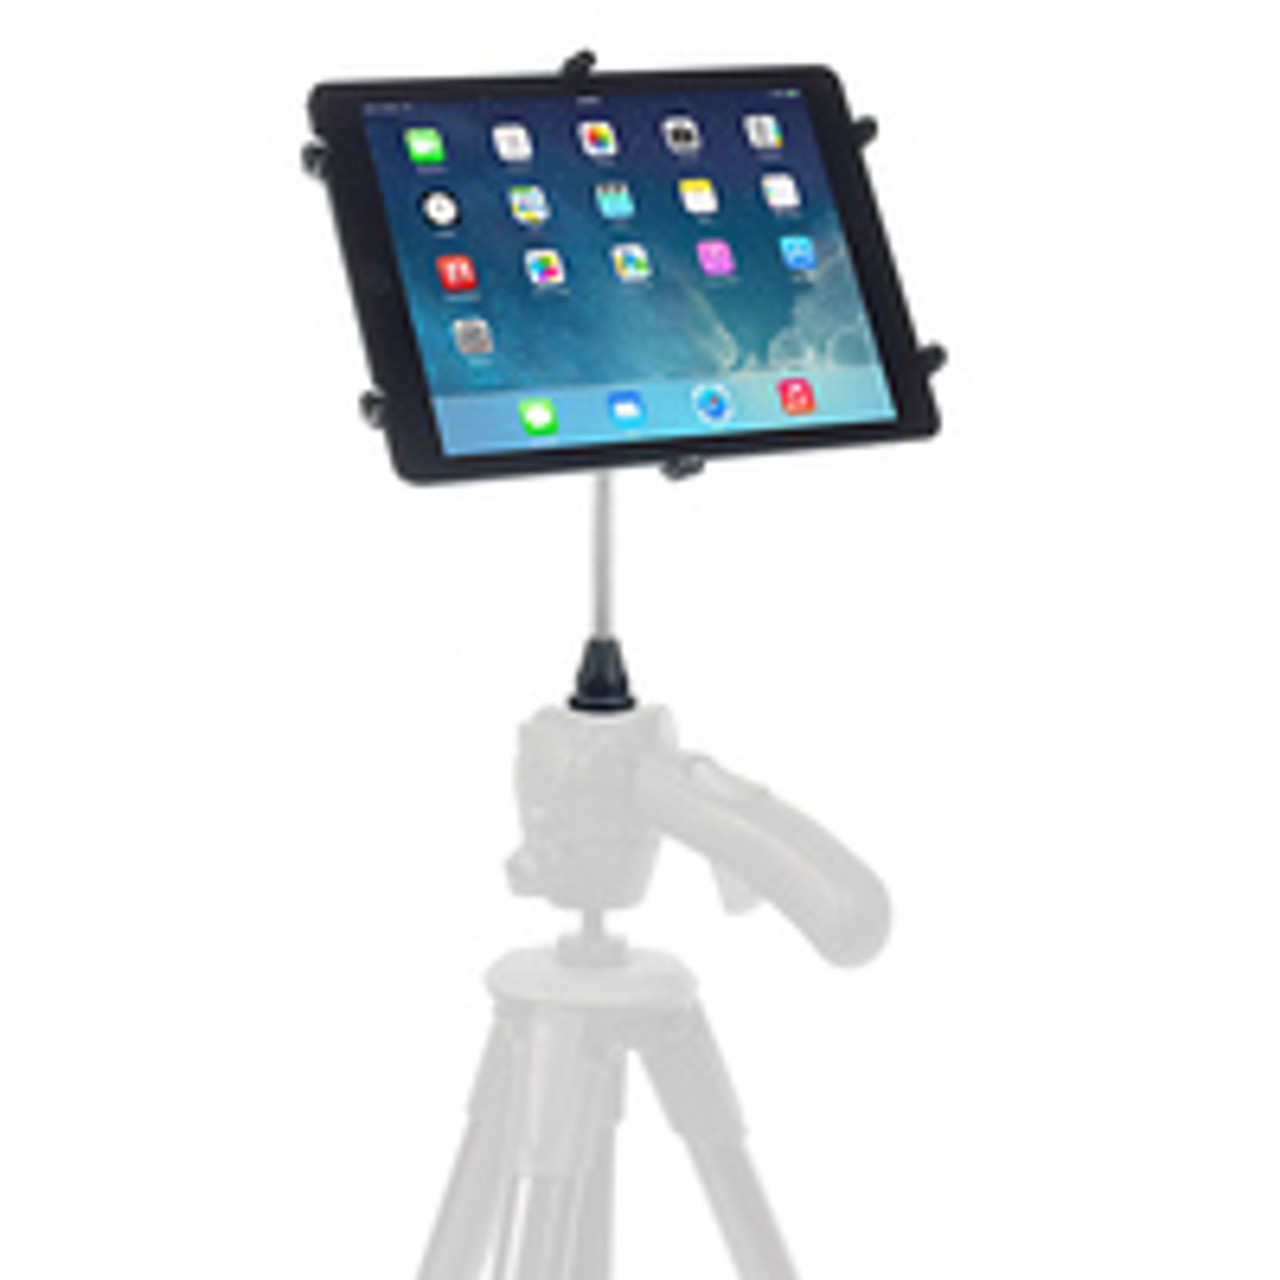 iPad Air, iPad mini iPad, iPhone, iPod Tripod Mount or Adapter